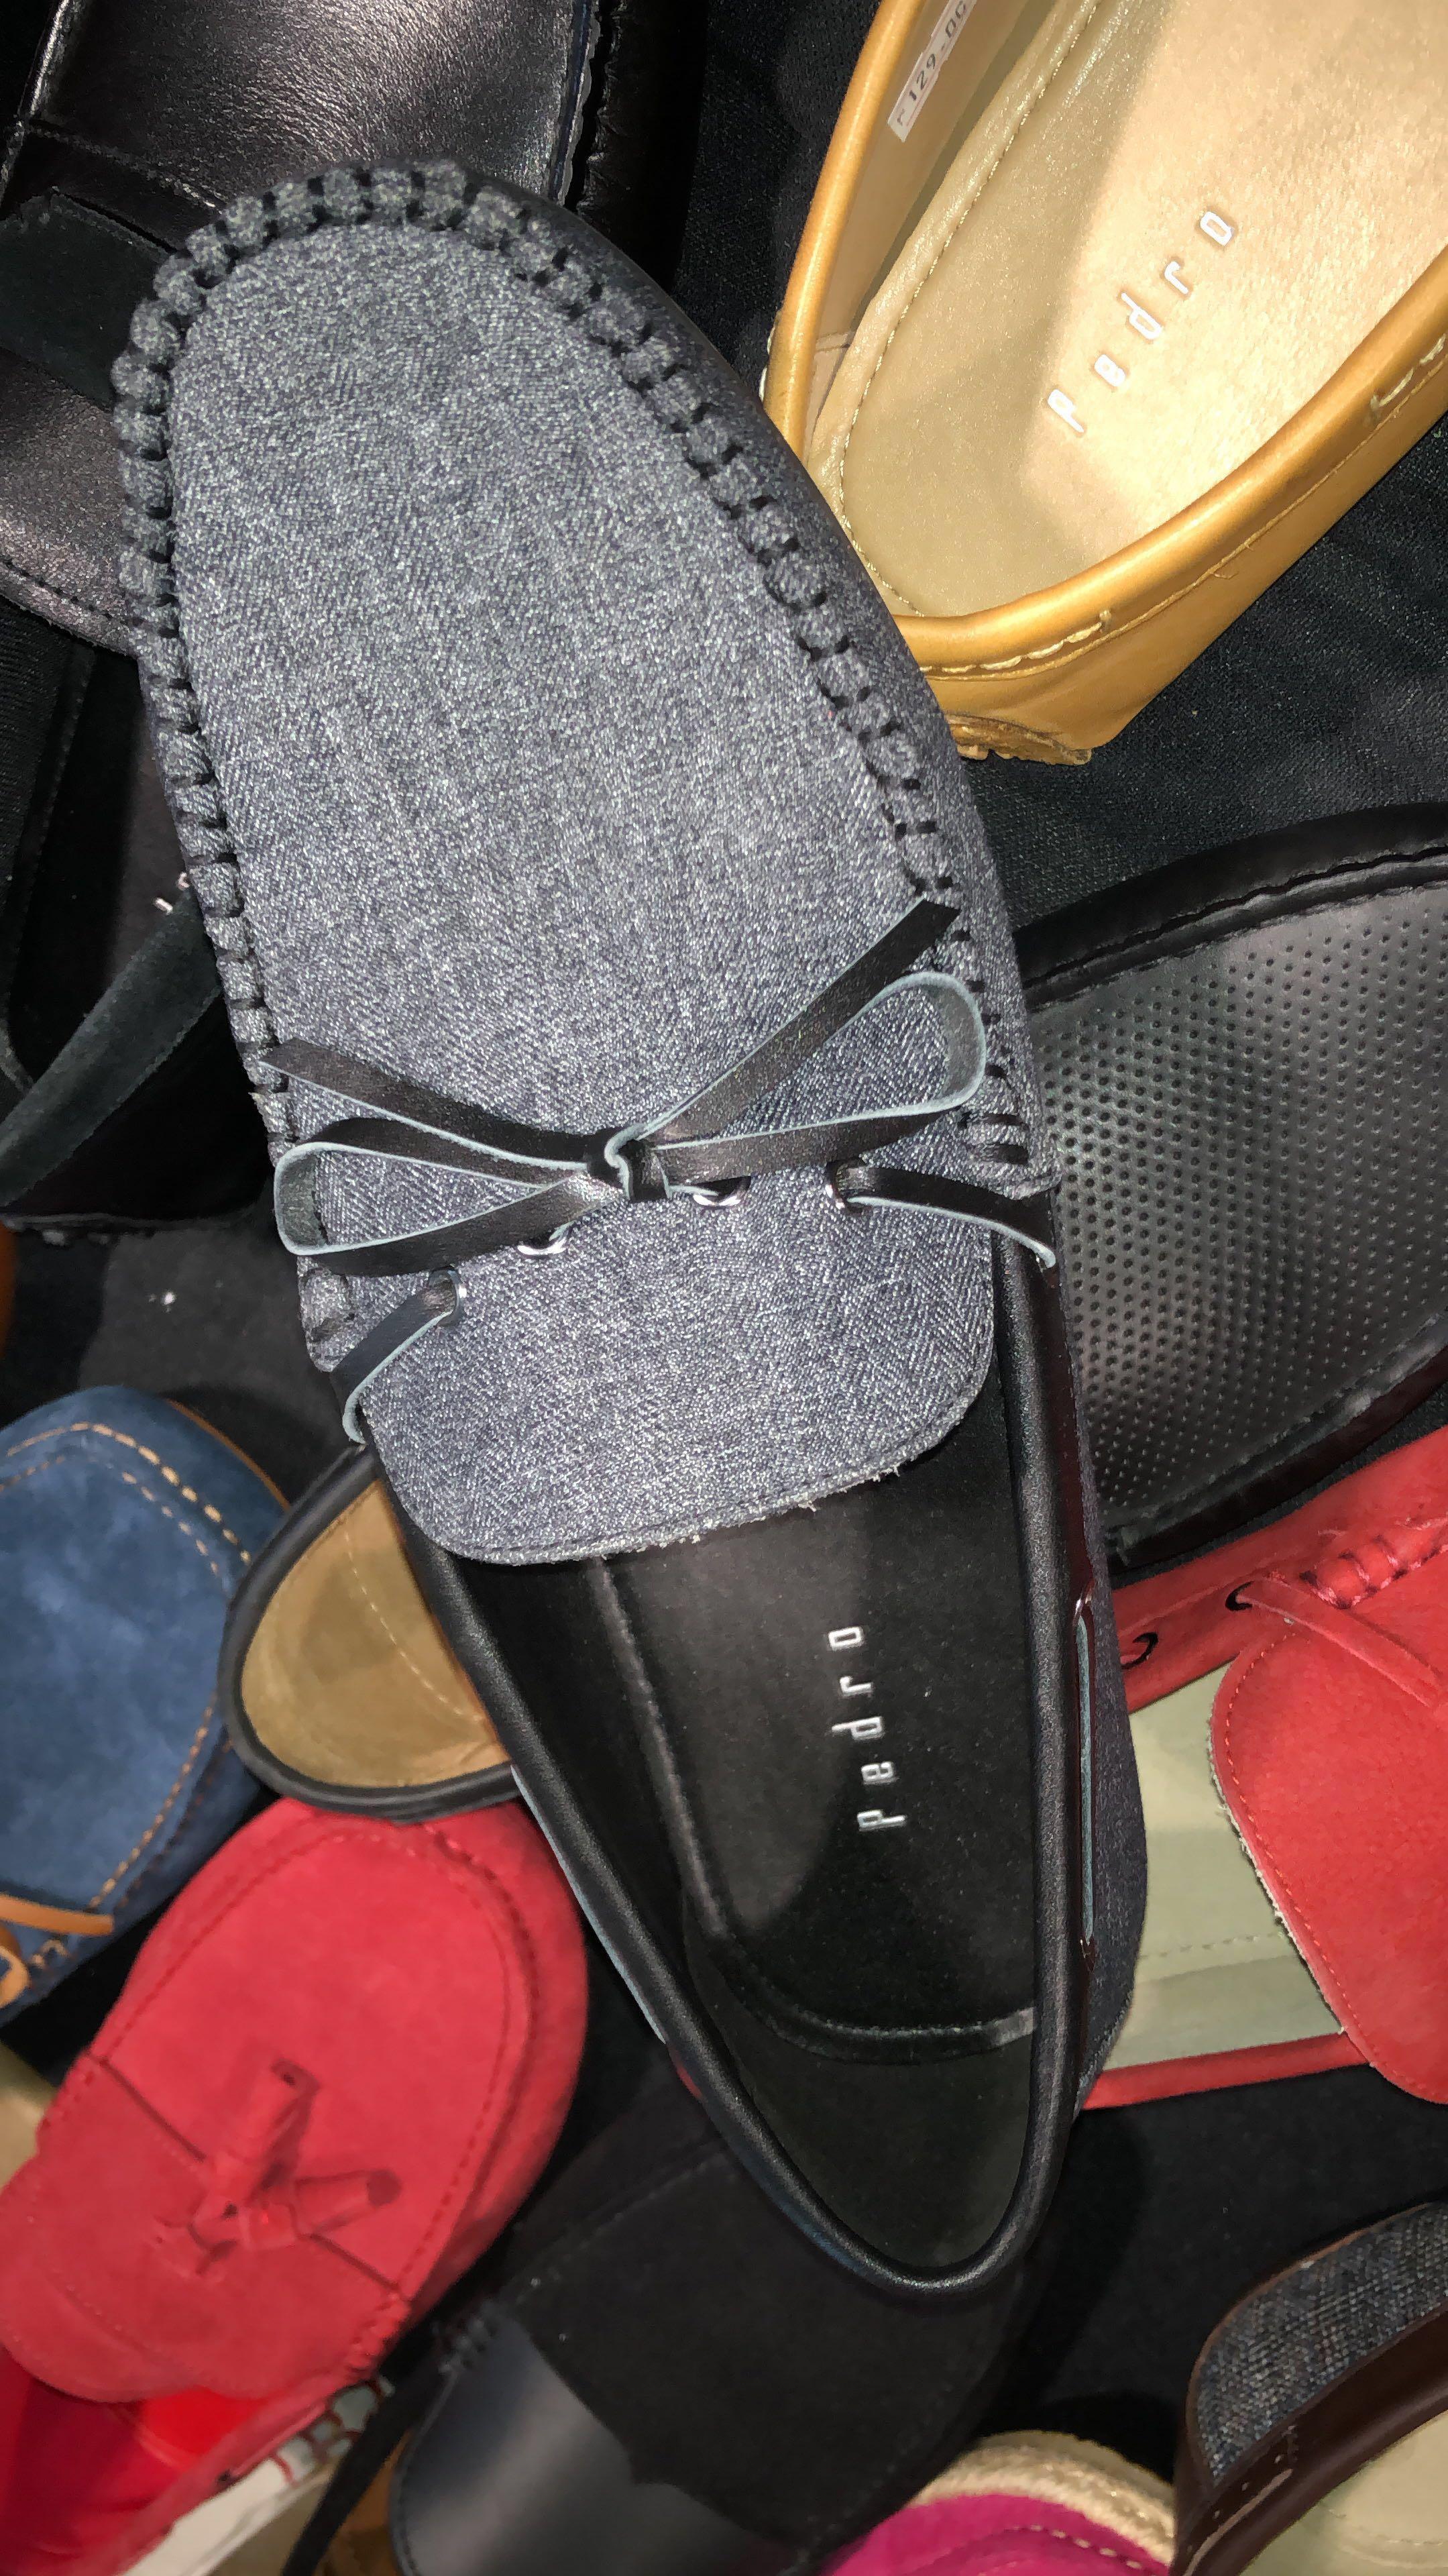 ac89d00453a Home · Men s Fashion · Footwear. photo photo photo photo photo